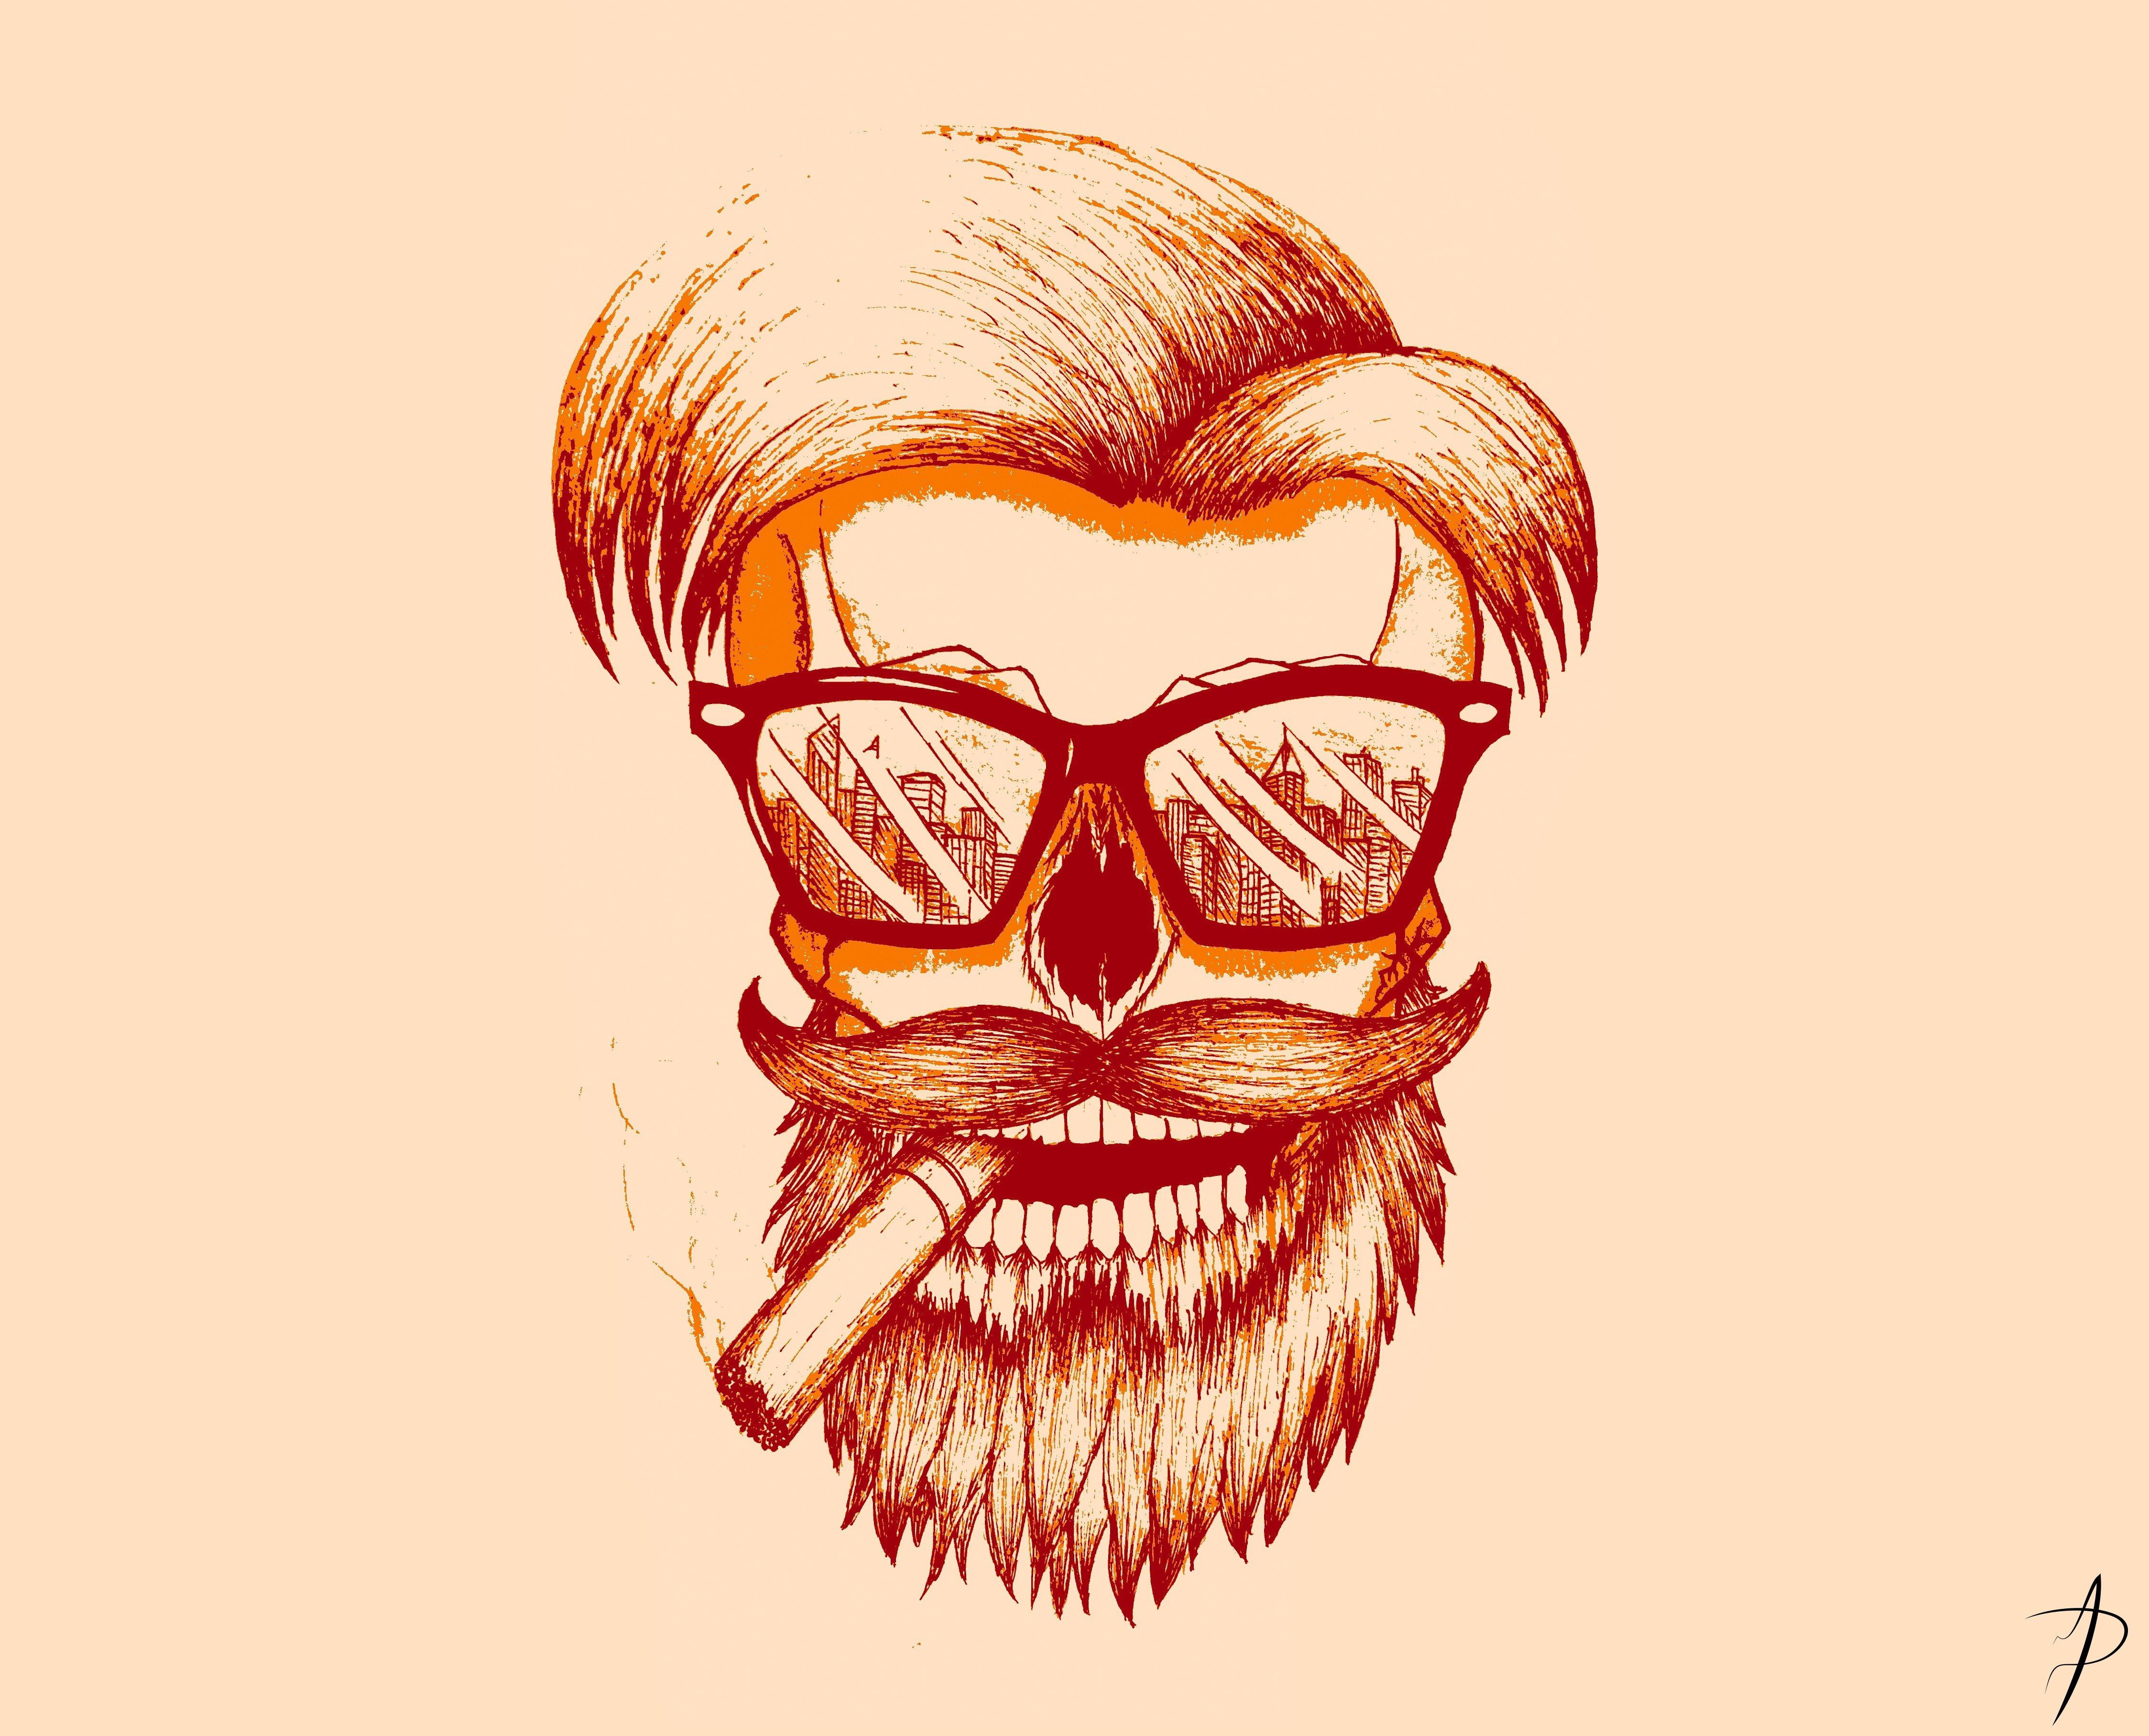 beard man wallpaper hd,face,facial hair,beard,illustration,nose